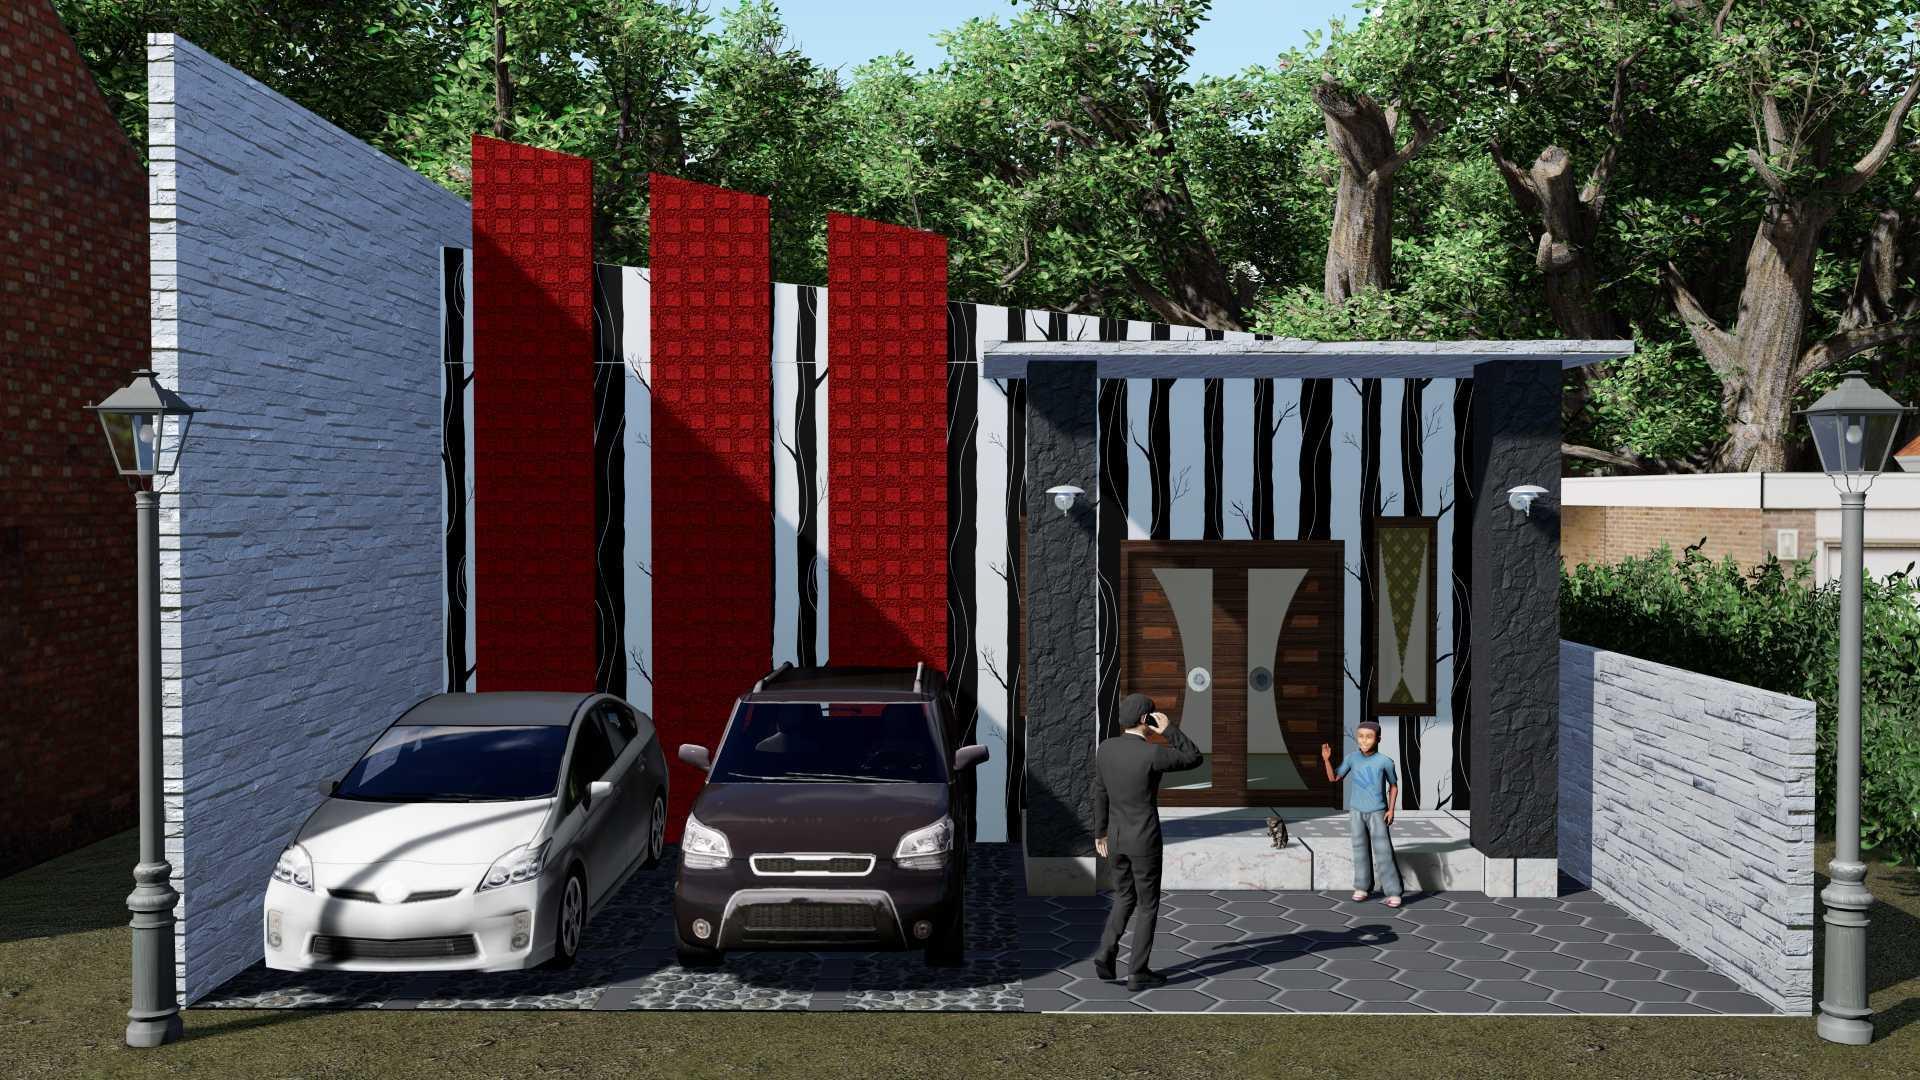 Sorin Architect Rumah Tipe 70 Malang, Kota Malang, Jawa Timur, Indonesia Malang, Kota Malang, Jawa Timur, Indonesia Sorin-Architect-Rumah-Tipe-70  114398